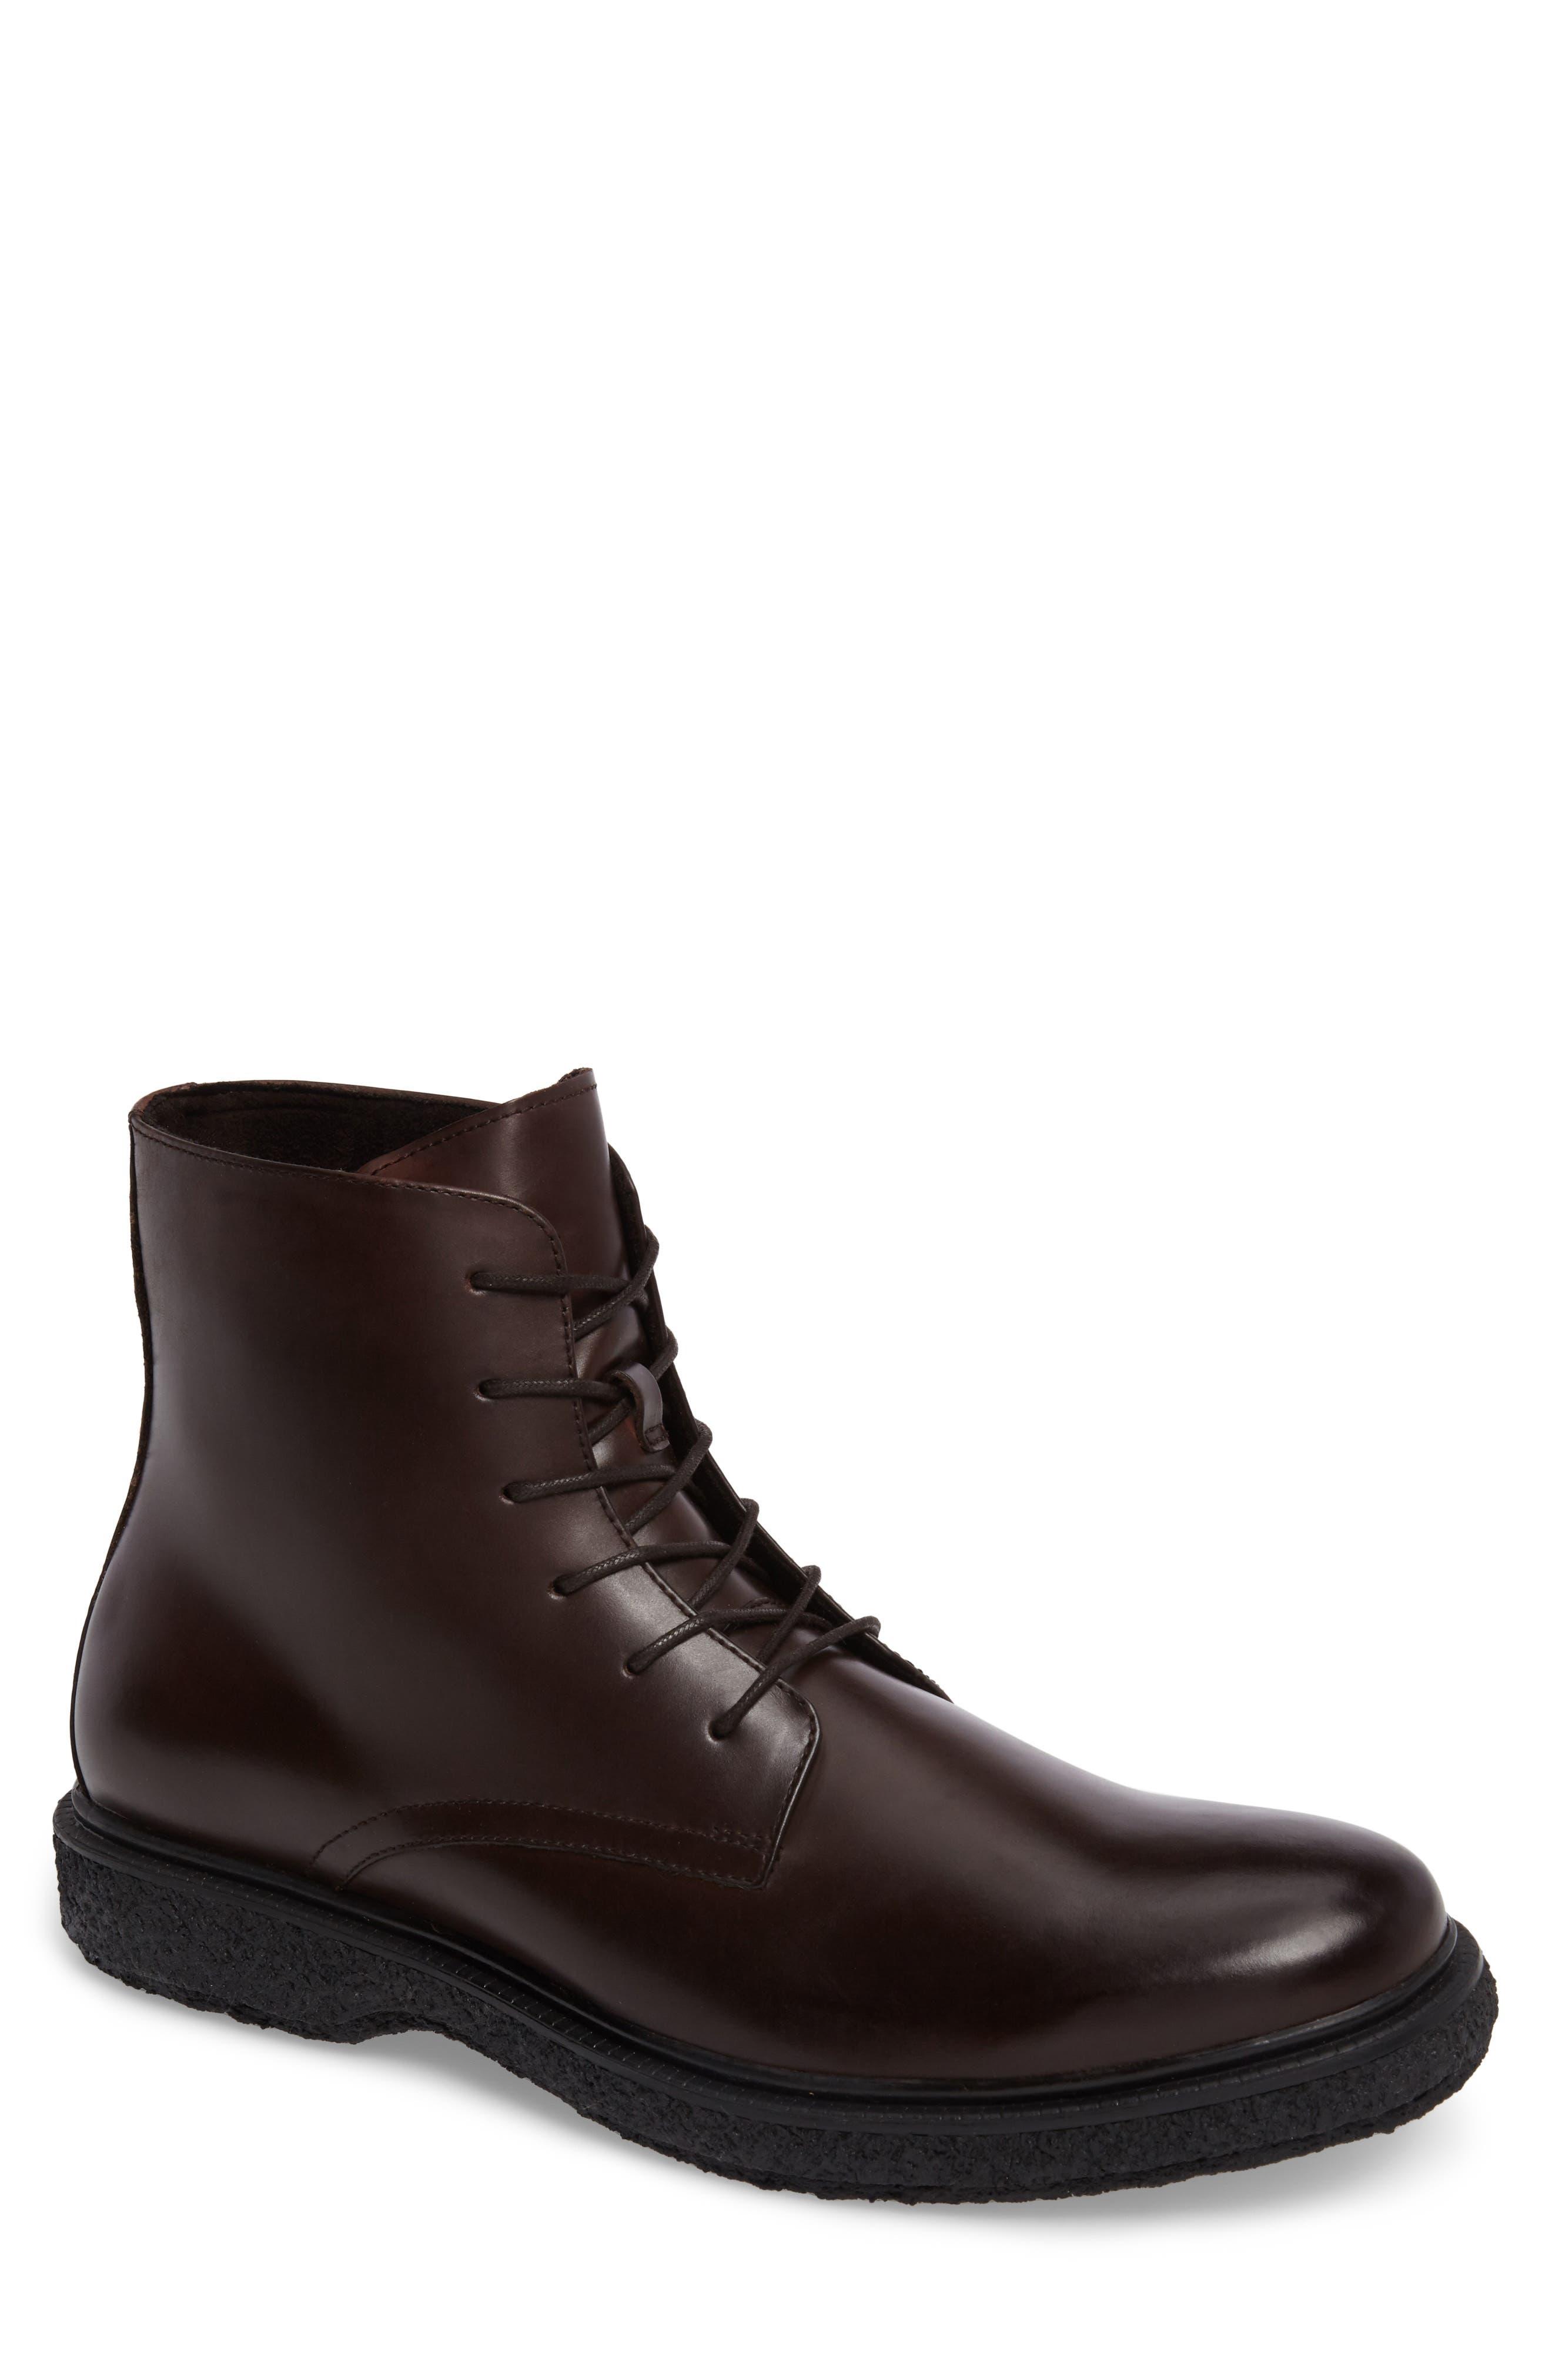 Plain Toe Boot,                             Main thumbnail 1, color,                             Brown Leather